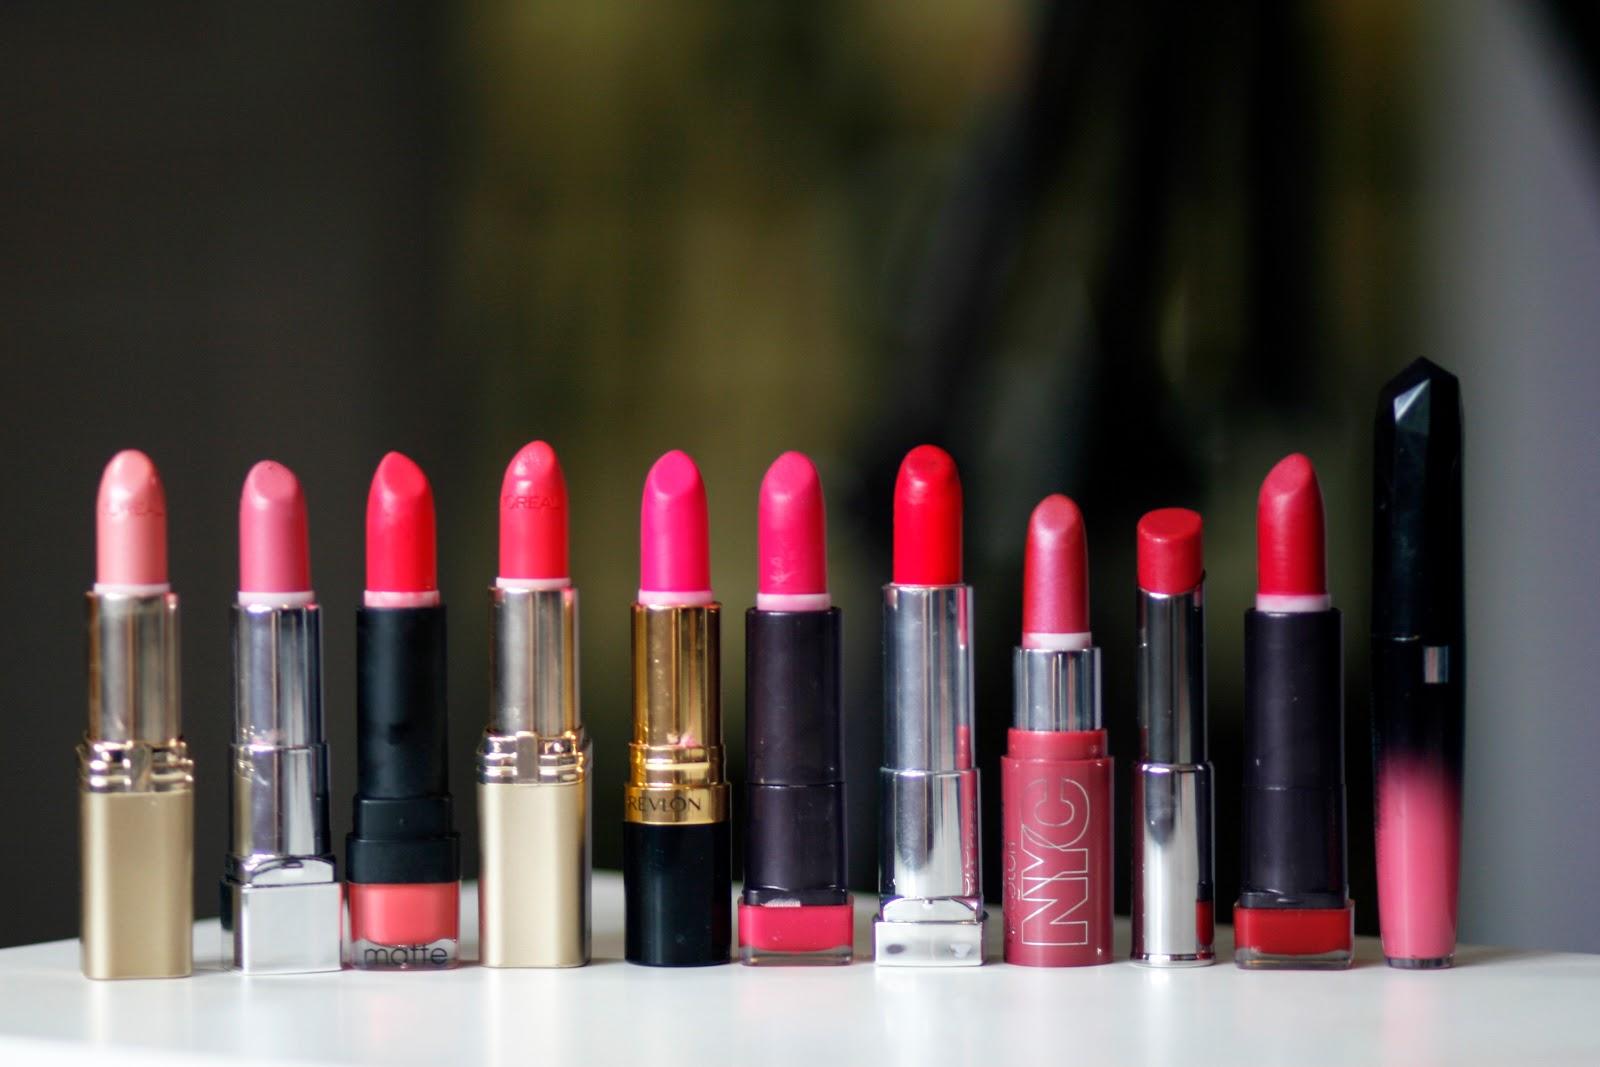 fun size beauty: LIPSTICK GRAVEYEARD + Lipstick Collection ... | 1600 x 1067 jpeg 135kB